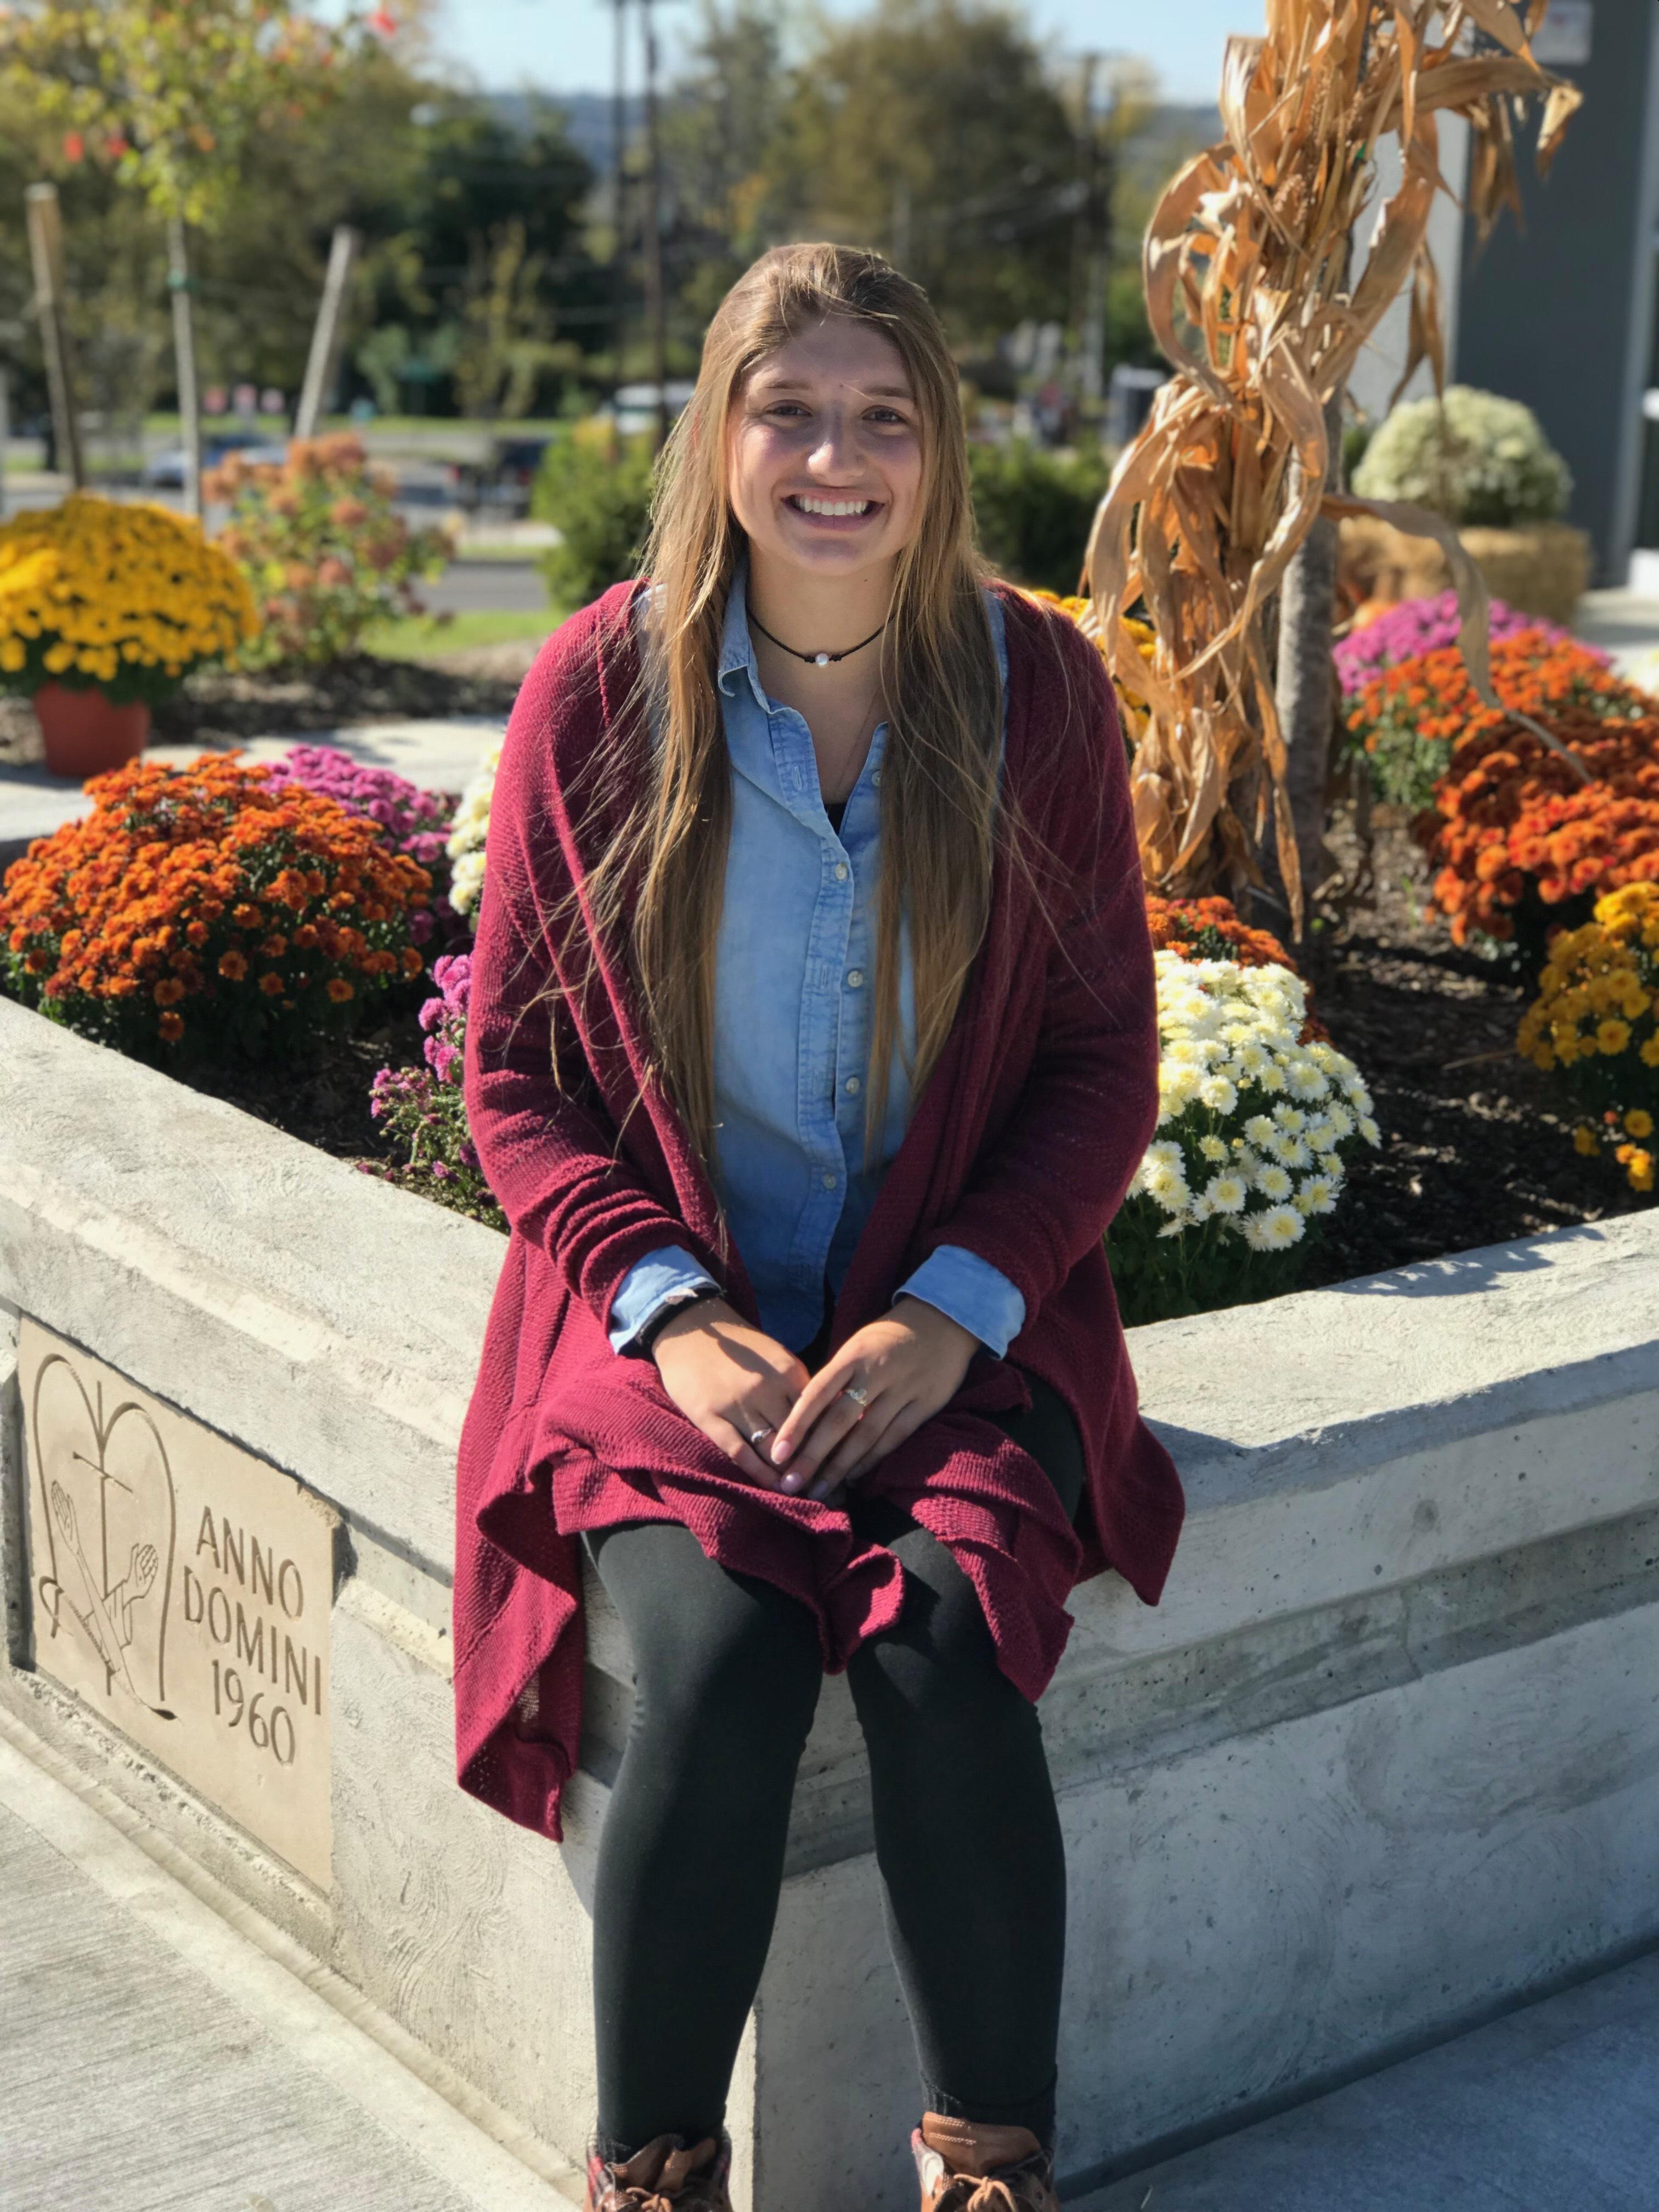 Resident Spotlight: Meet Student Athlete Linnea D'Acchille